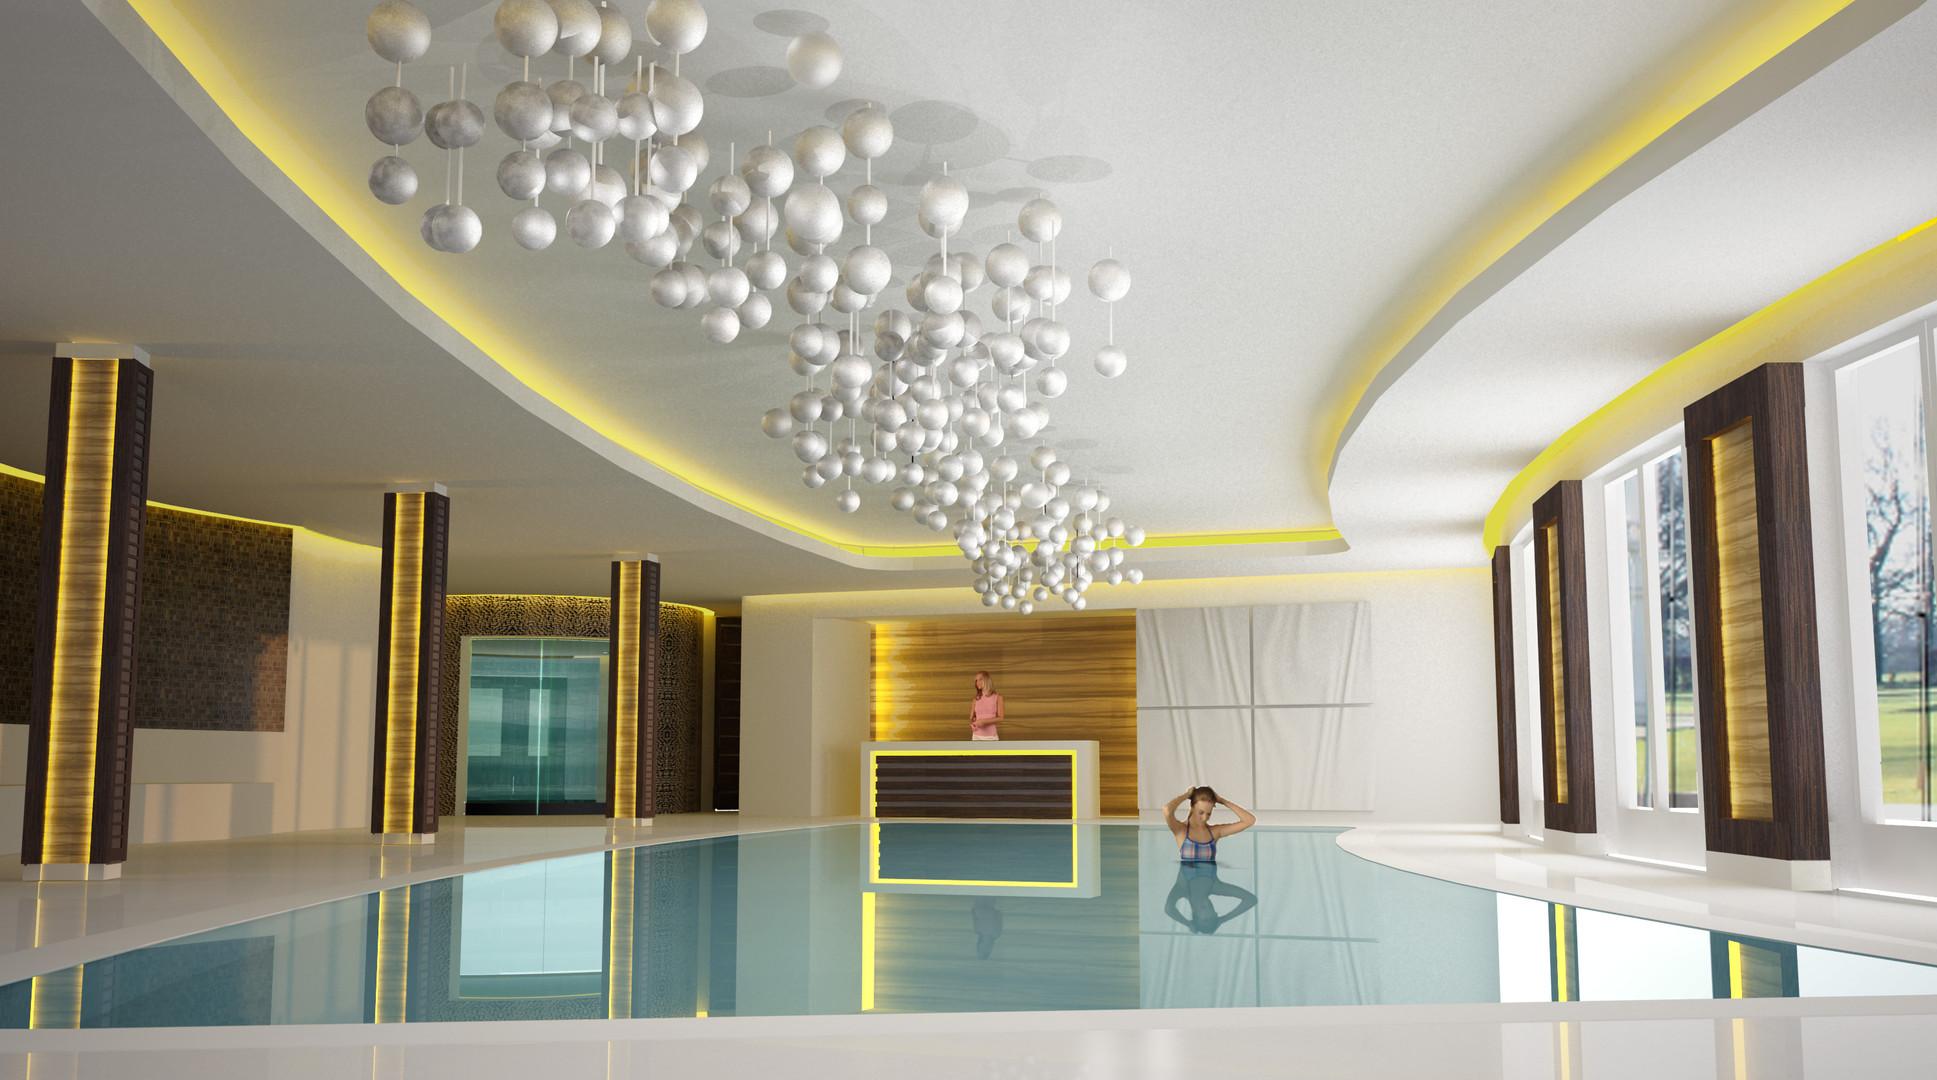 Pool room normal - less yellow.jpg